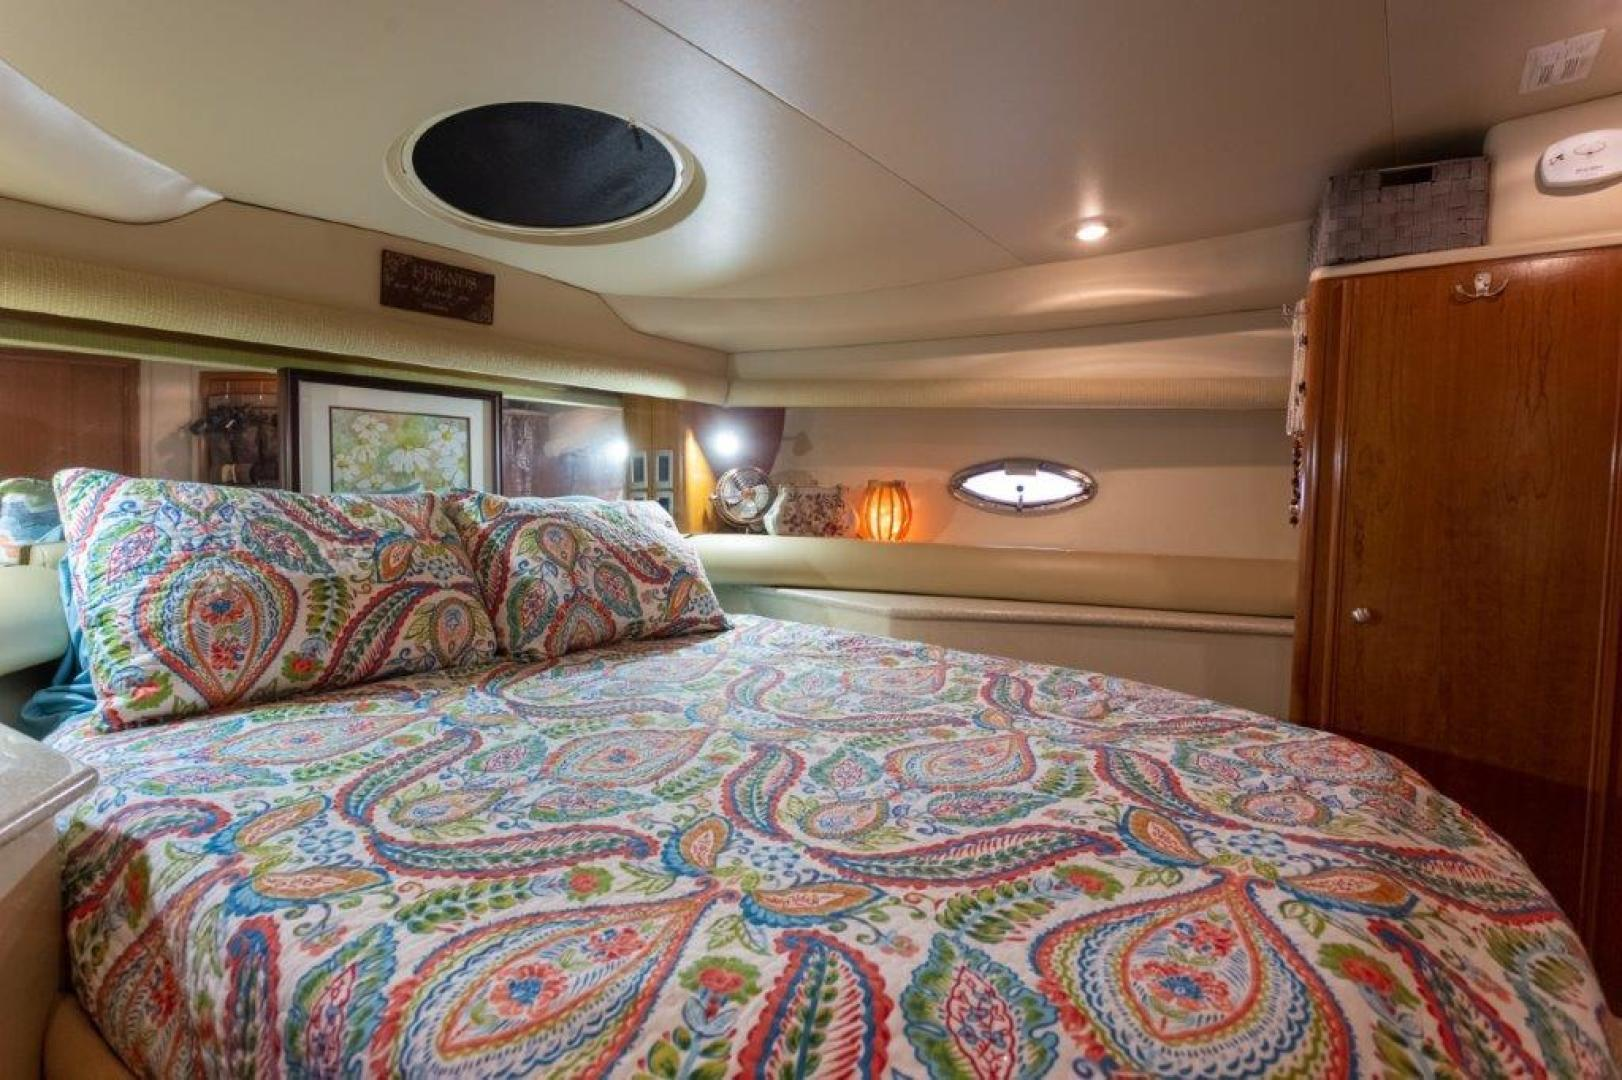 Meridian-459 Motoryacht 2004-Total Pleasure Chattanooga-Tennessee-United States-553097 | Thumbnail